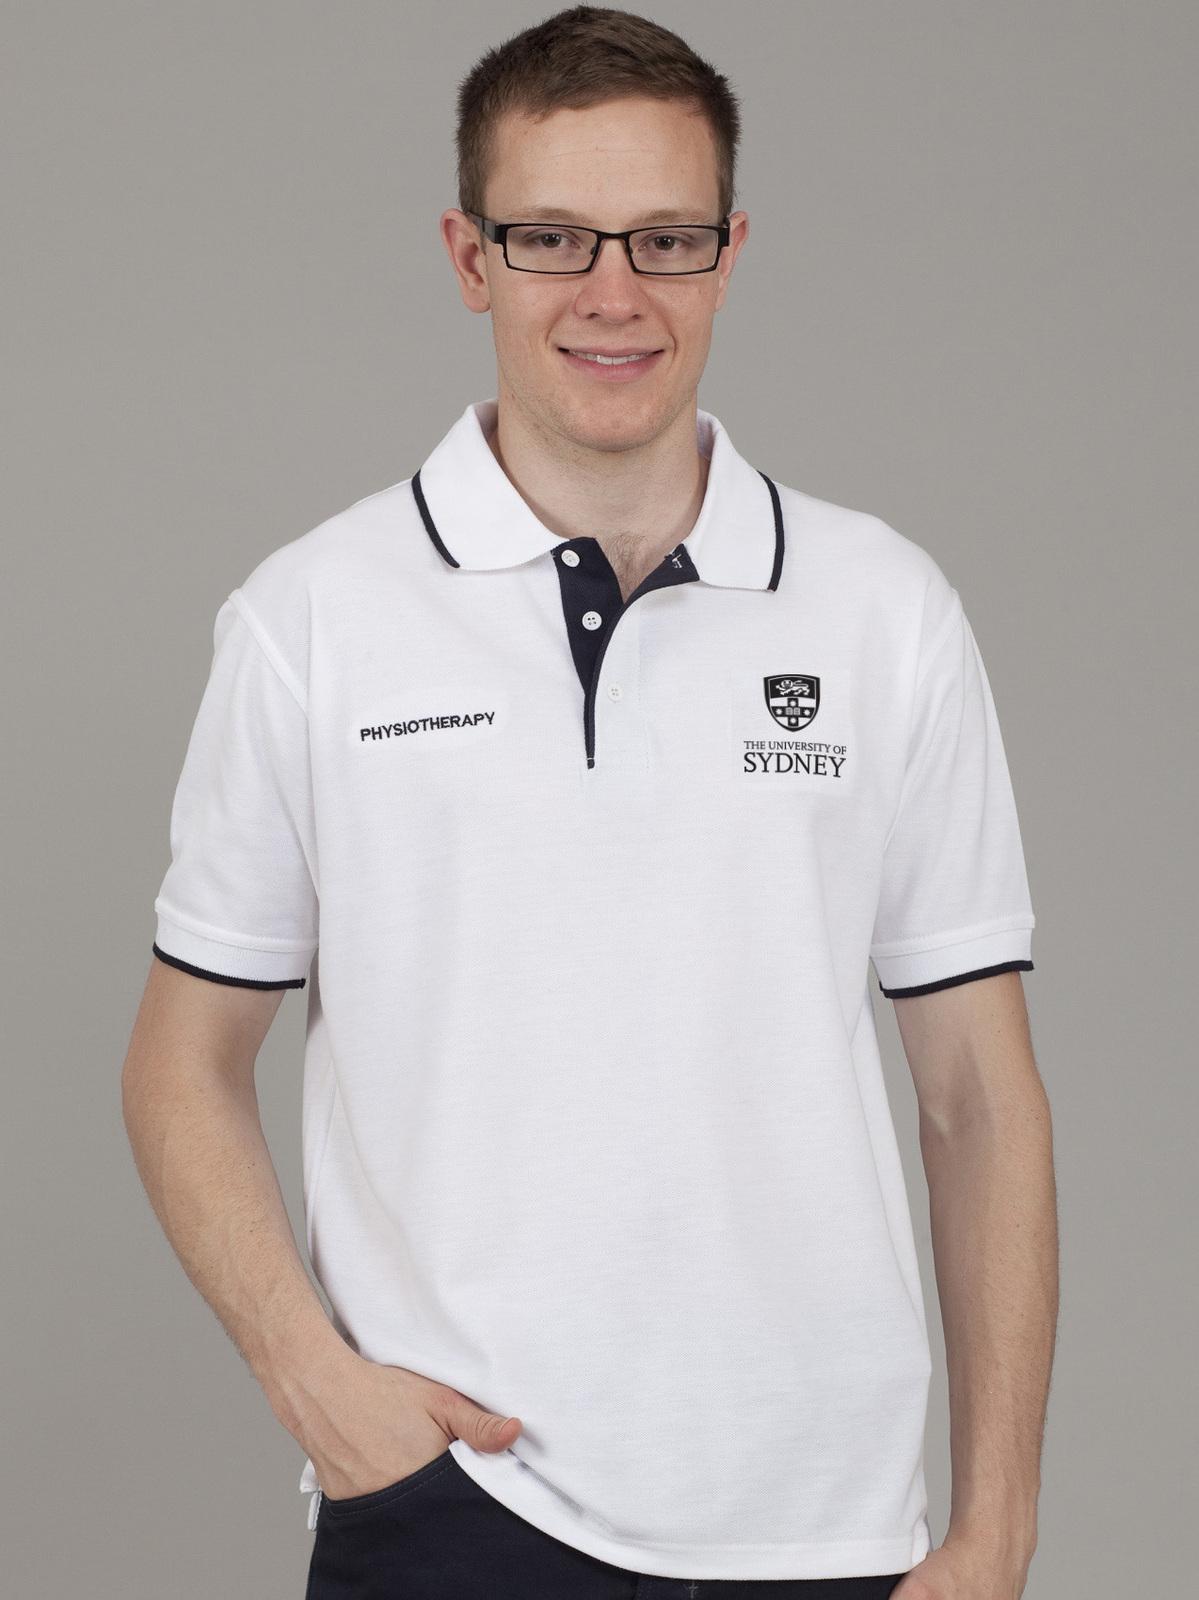 newest f1a8e 874c9 The University of Sydney eStore - Polo shirt - men's ...